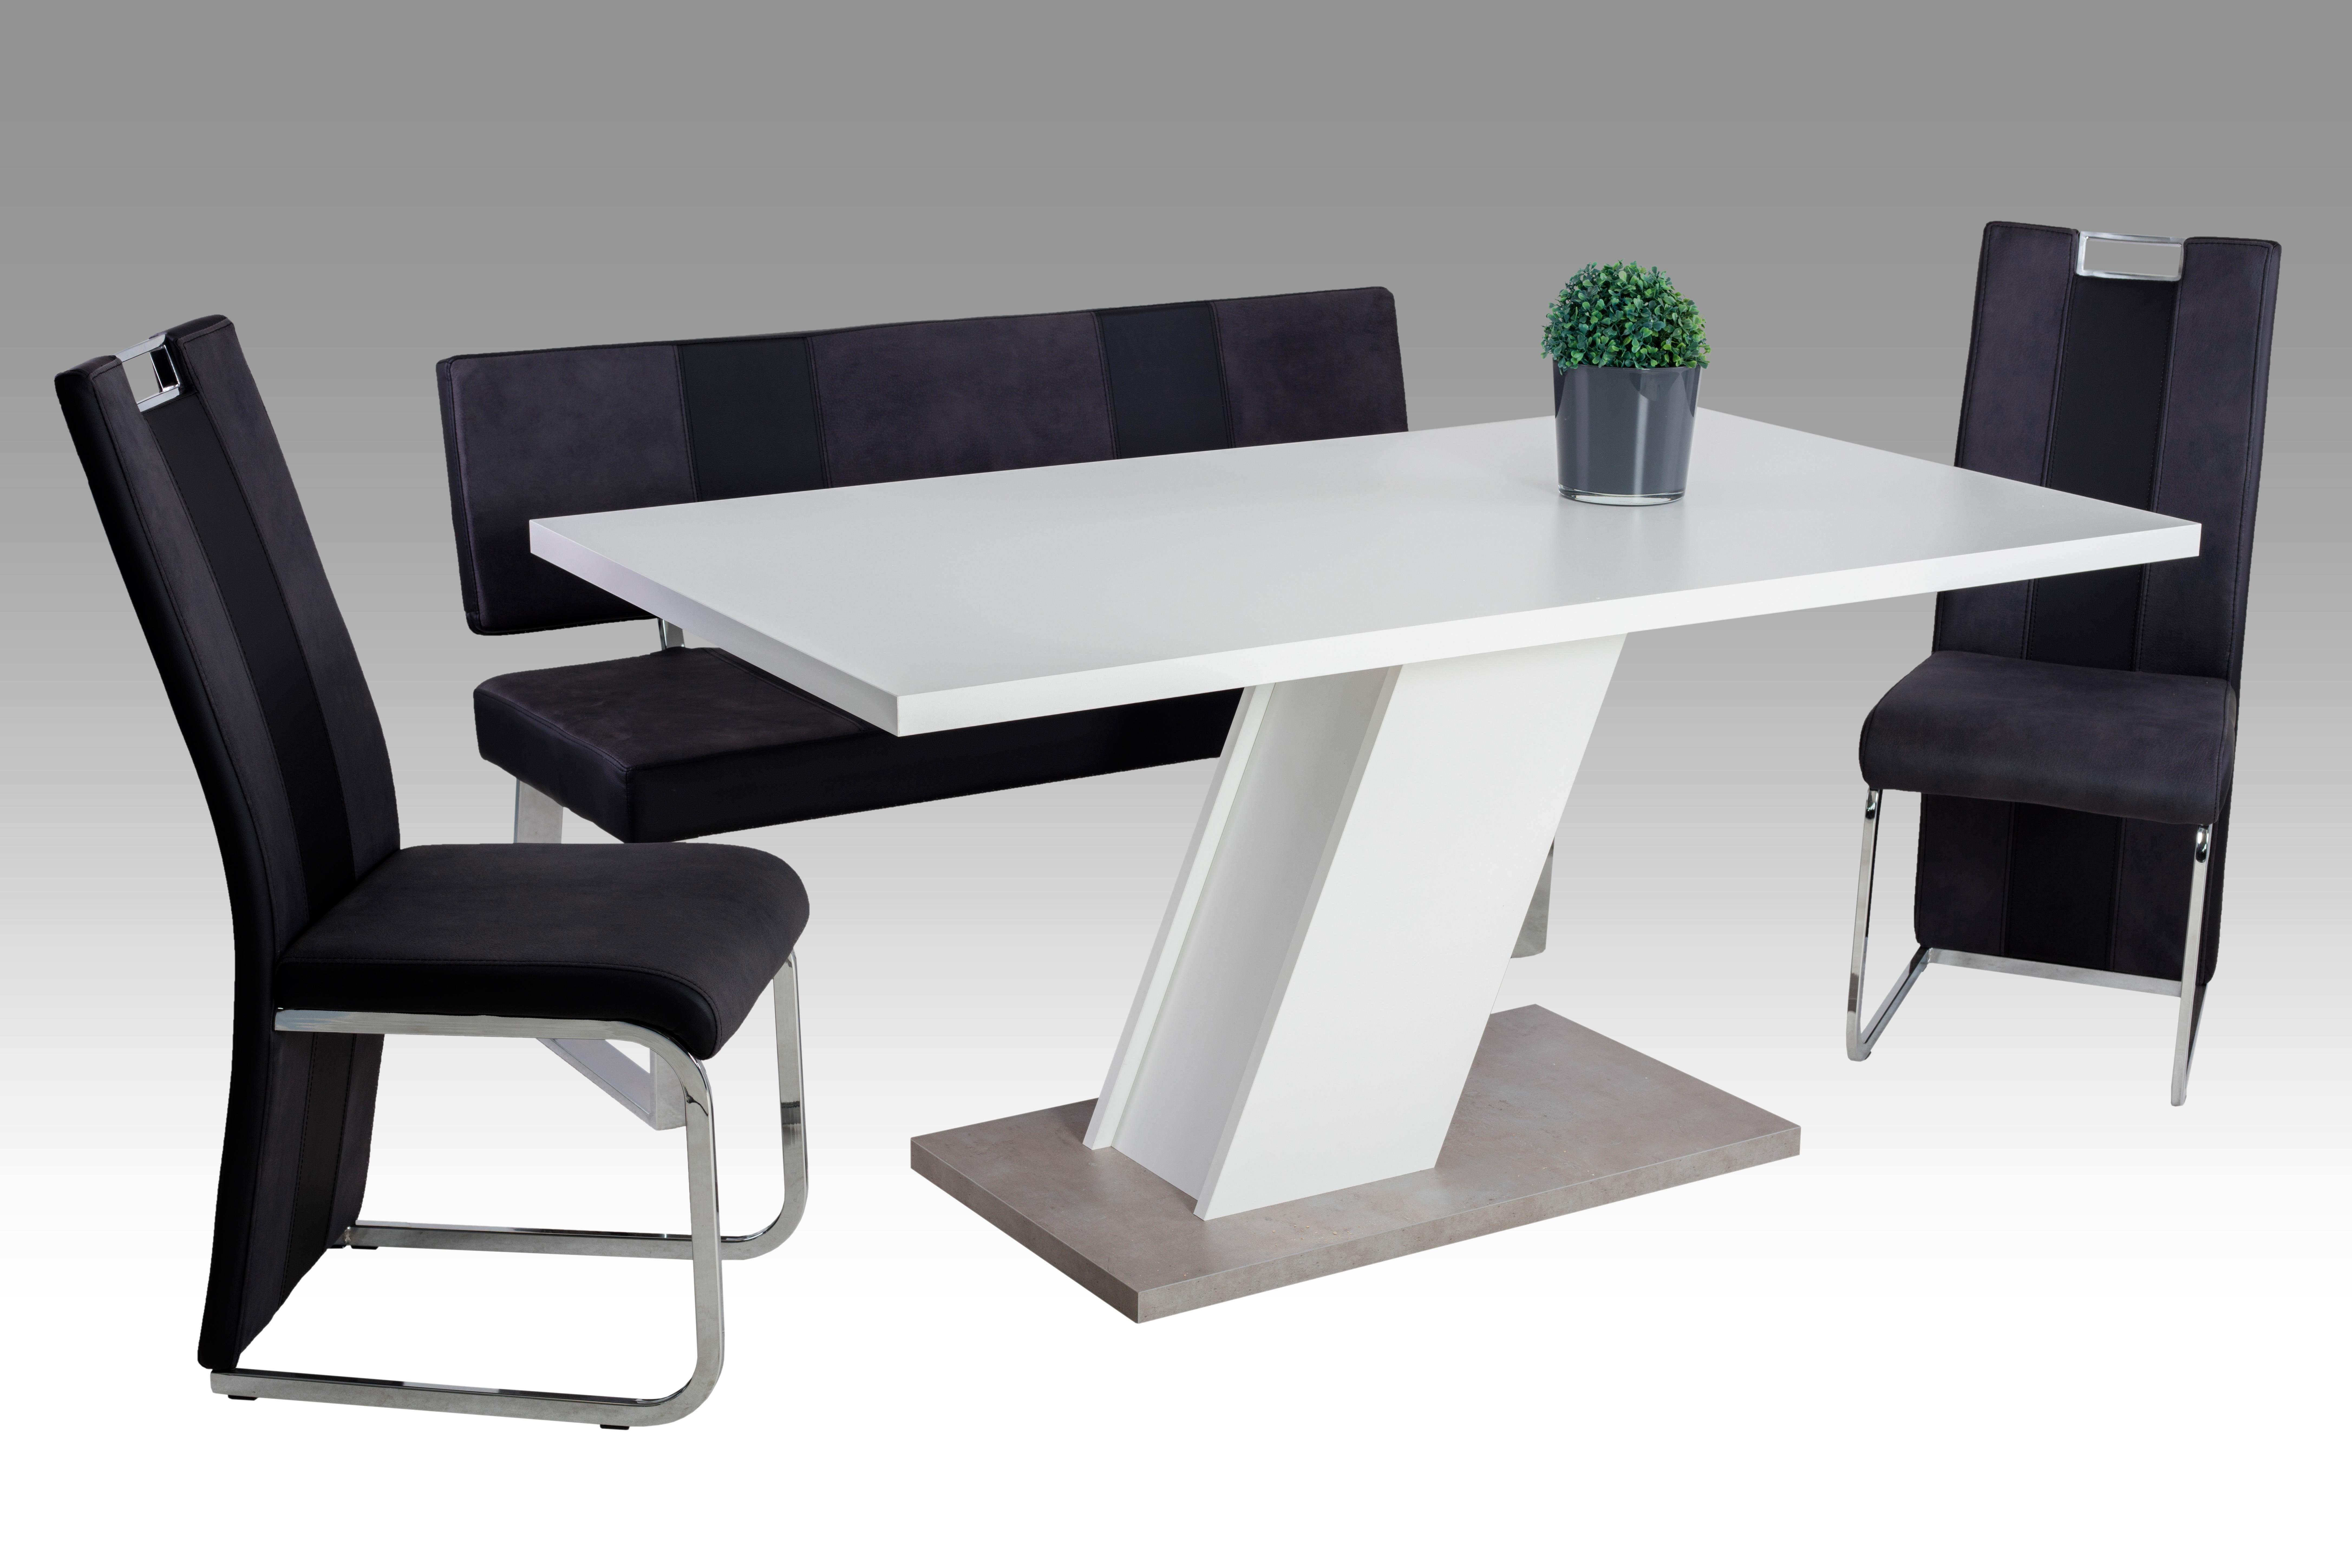 m belhaus 24 esstisch innsbruck wei 160 cm m belhaus 24 online m bel kaufen. Black Bedroom Furniture Sets. Home Design Ideas